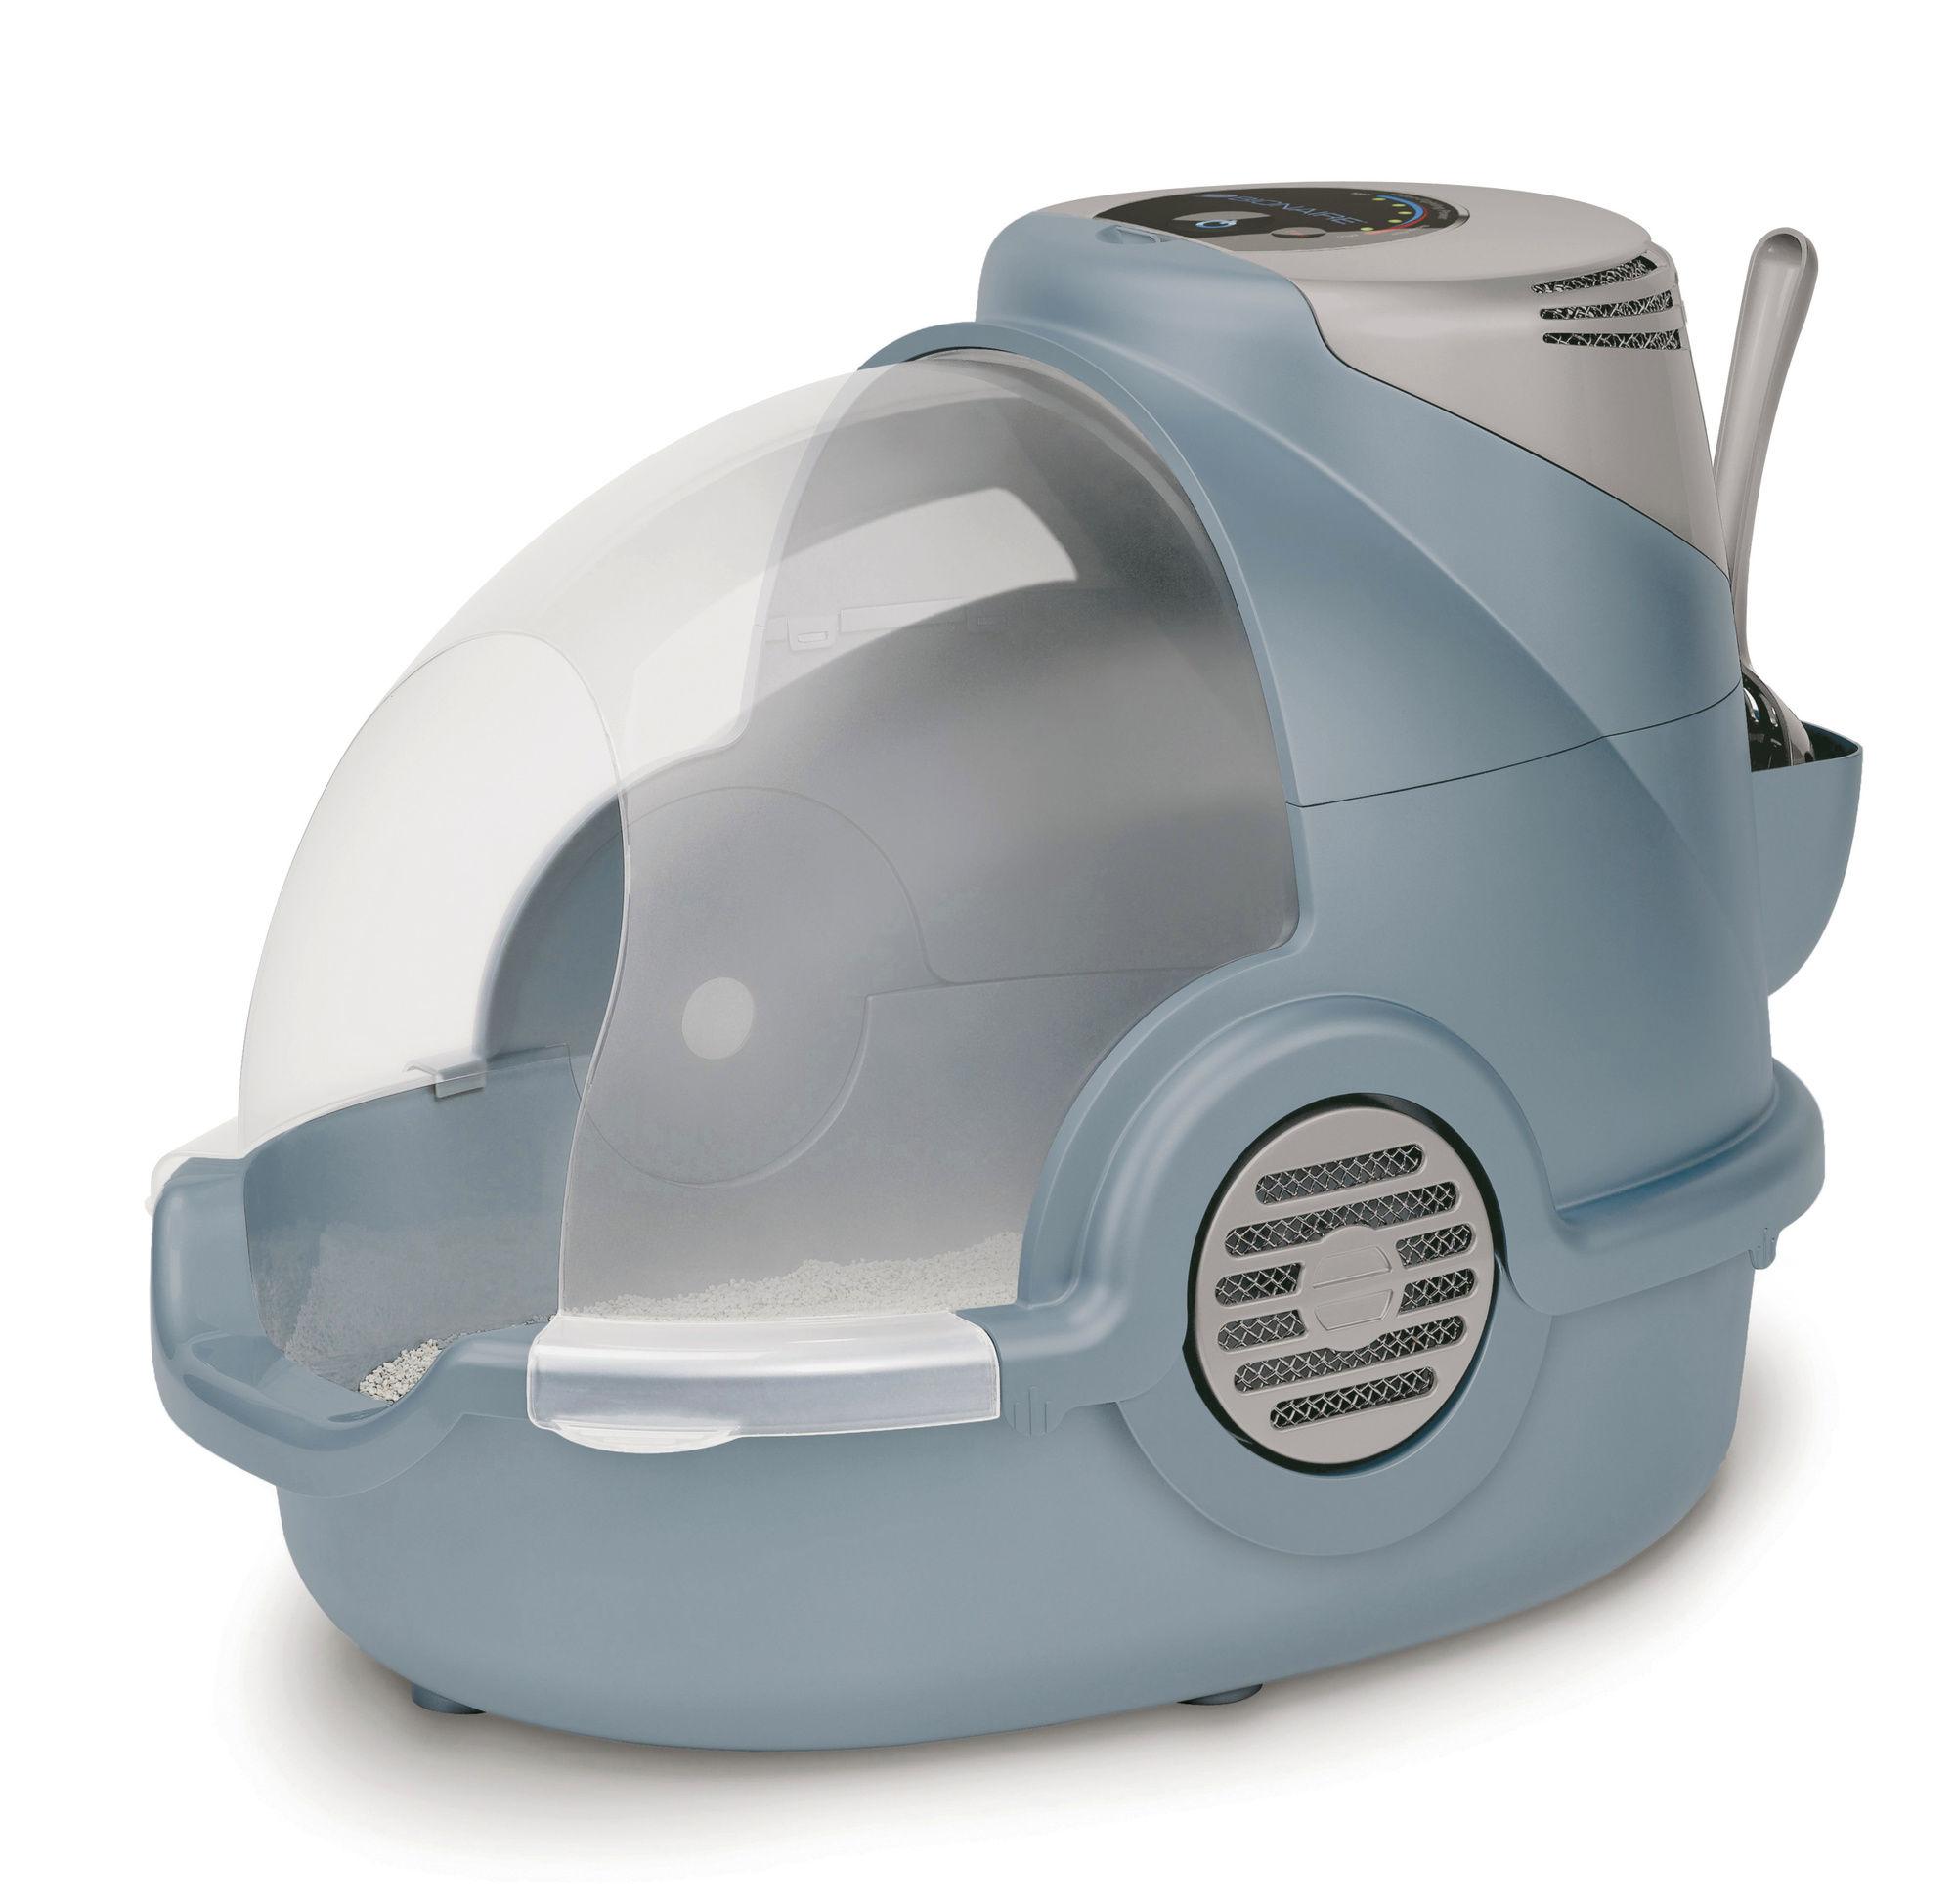 Oster Geruch entfernende Katzentoilette 220V